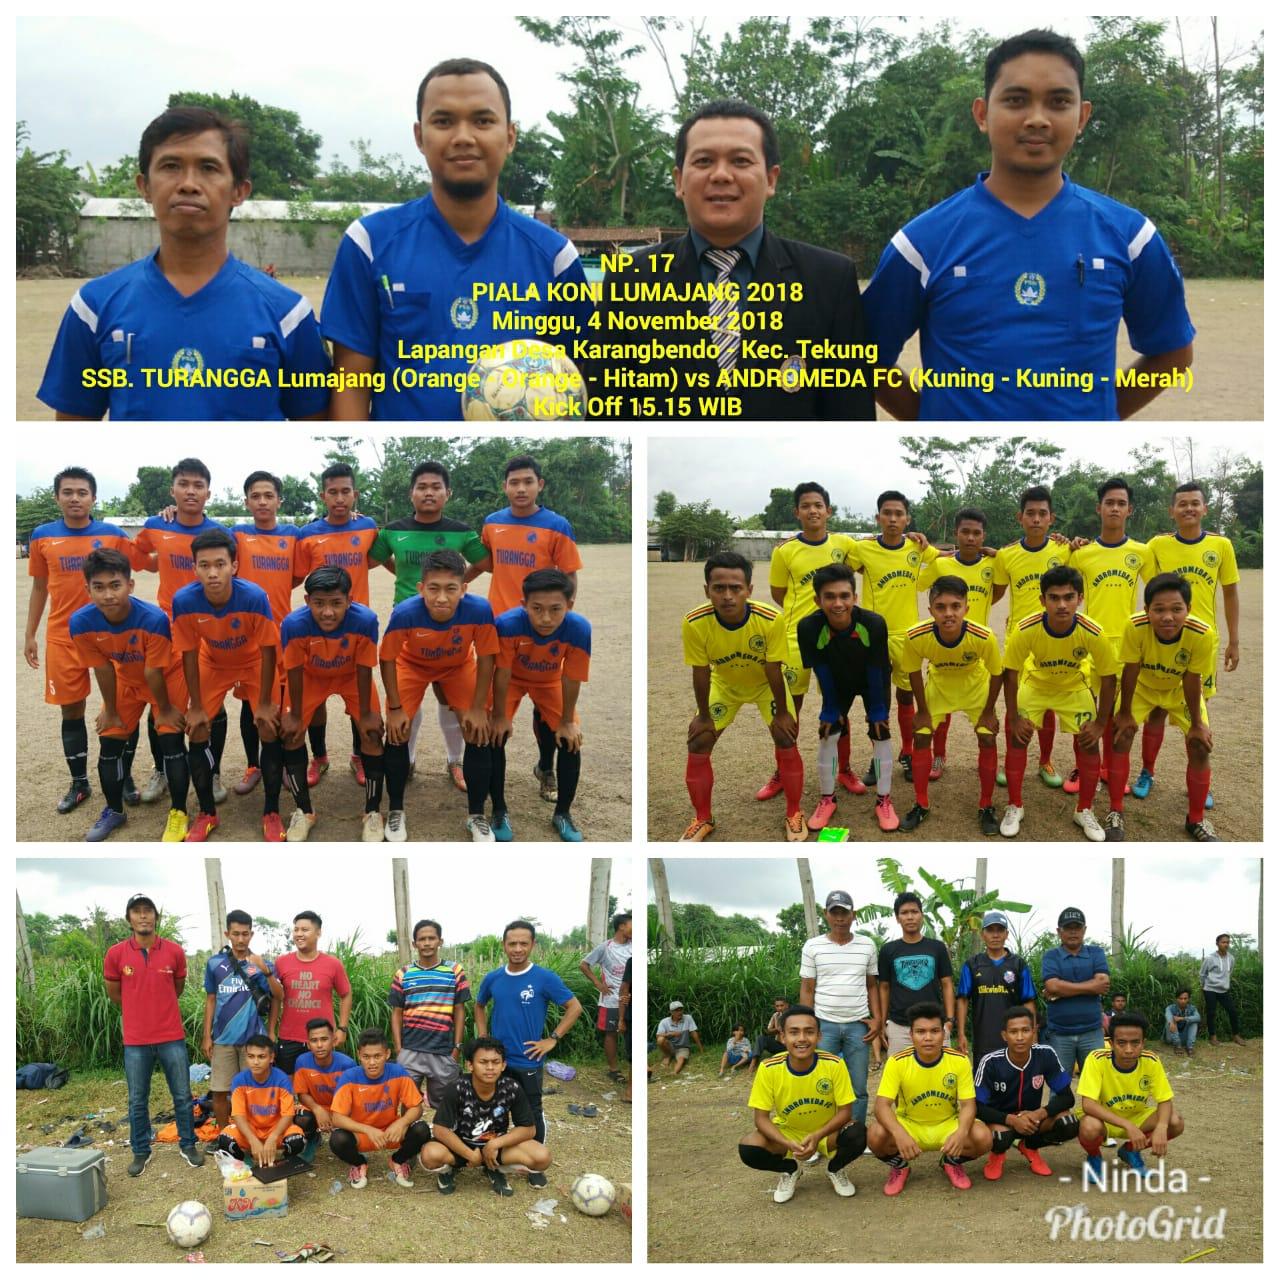 Sabtu Besok, Turangga Vs Patra Jaya  di Final Piala KONI Lumajang